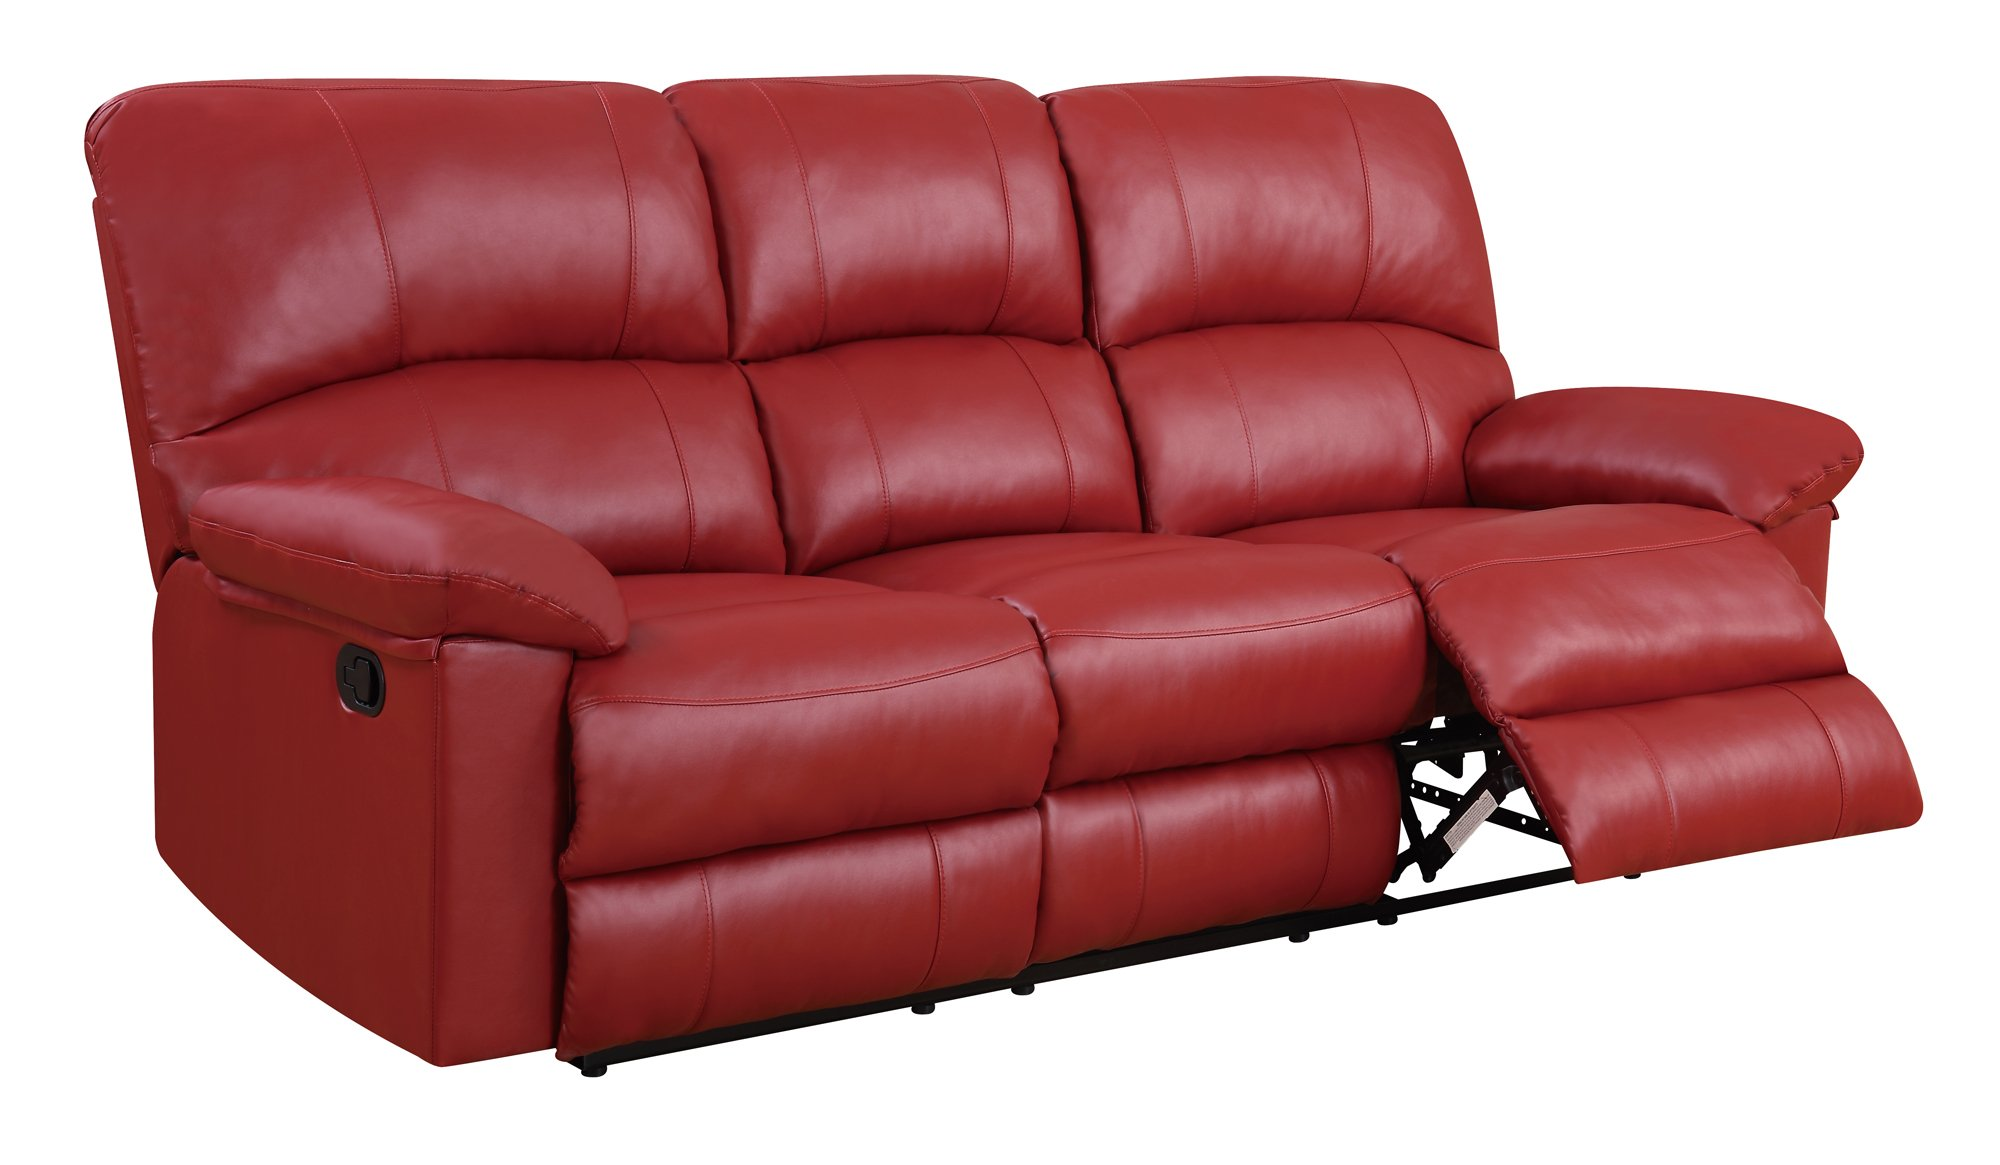 Photo Red Reclining Sofa Images Serta Sofa Reviews Images At  ~ Red Reclining Sectional Sofa